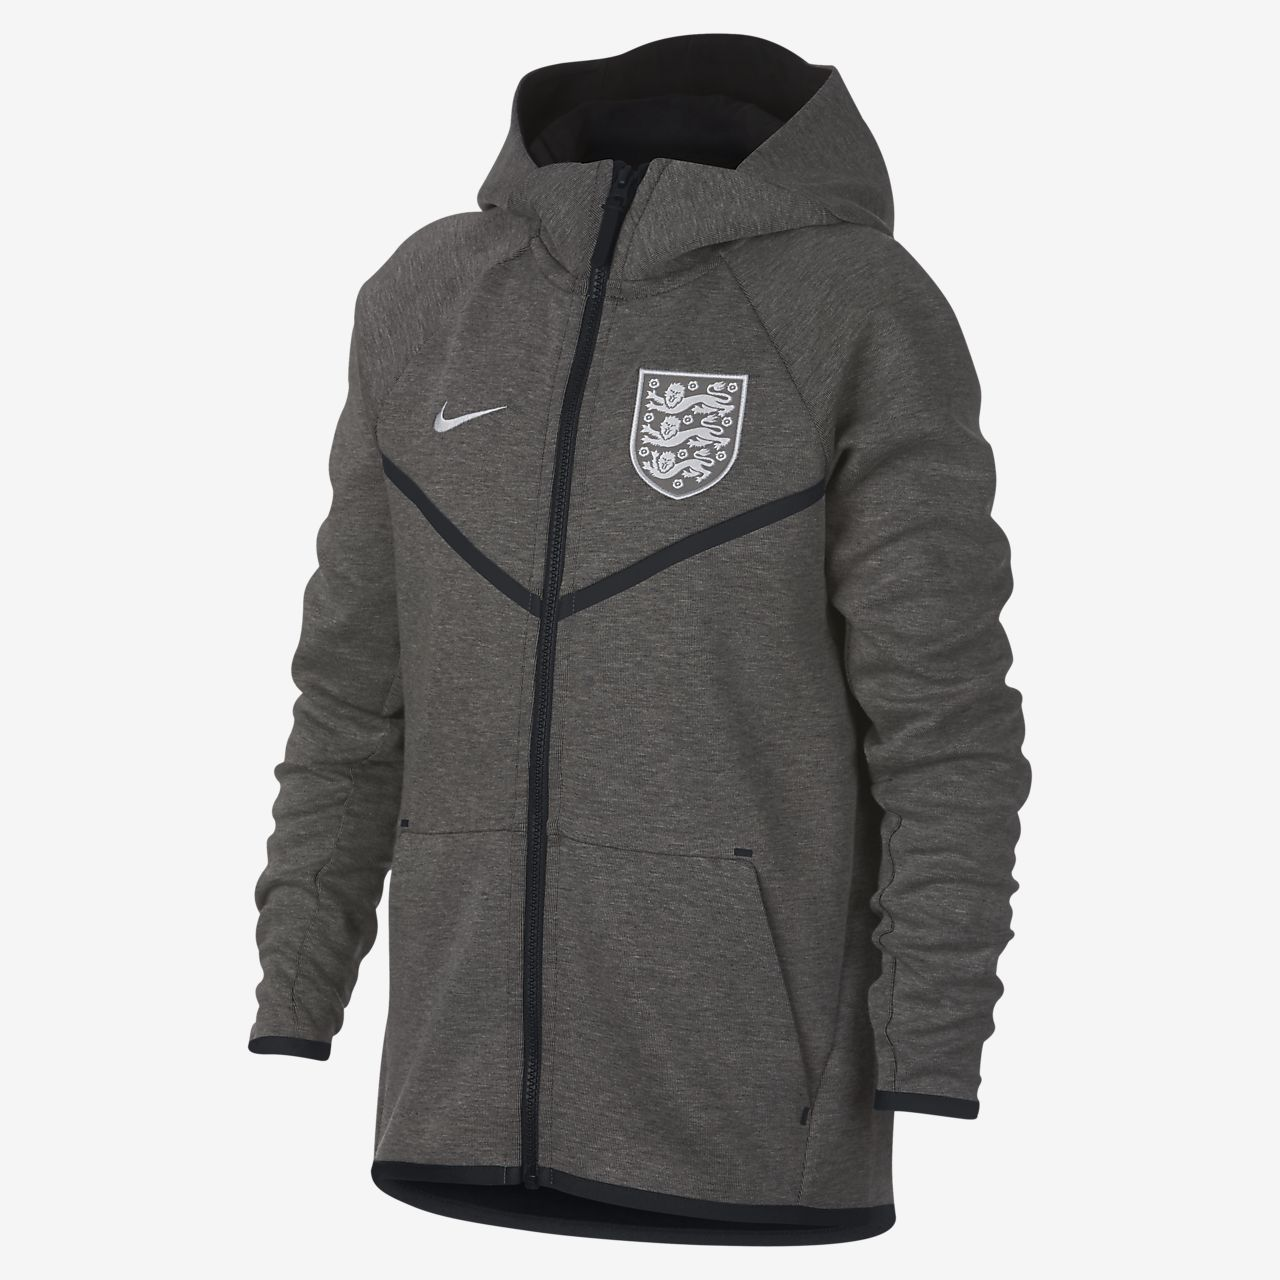 7cda9b411173 England Tech Fleece Windrunner Older Kids  Jacket. Nike.com GB